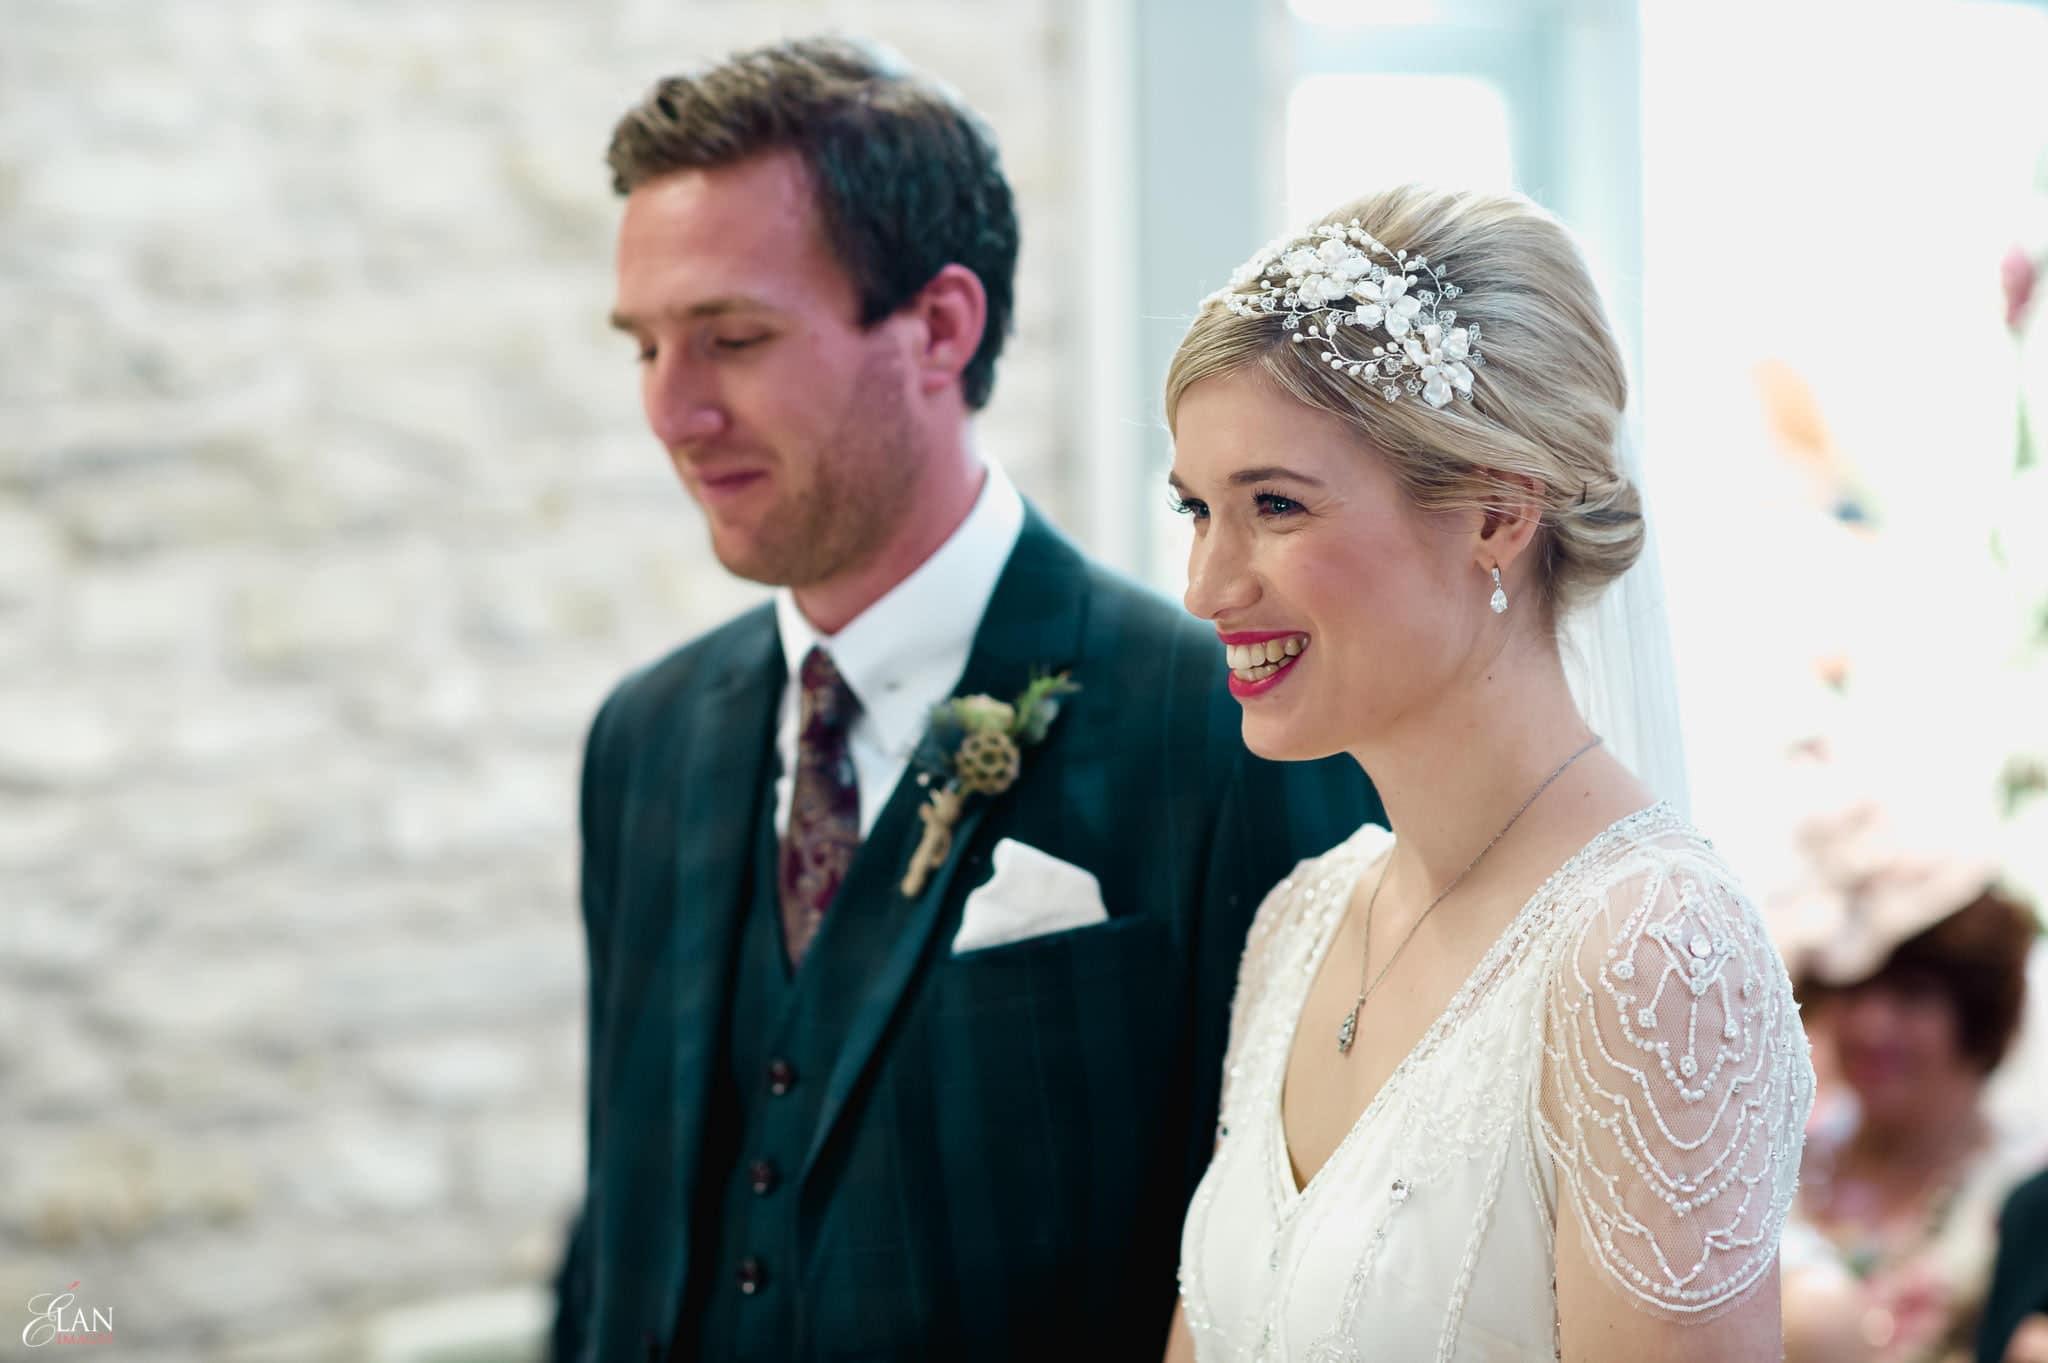 Spring Wedding at the Folly Farm Centre, Bristol 18